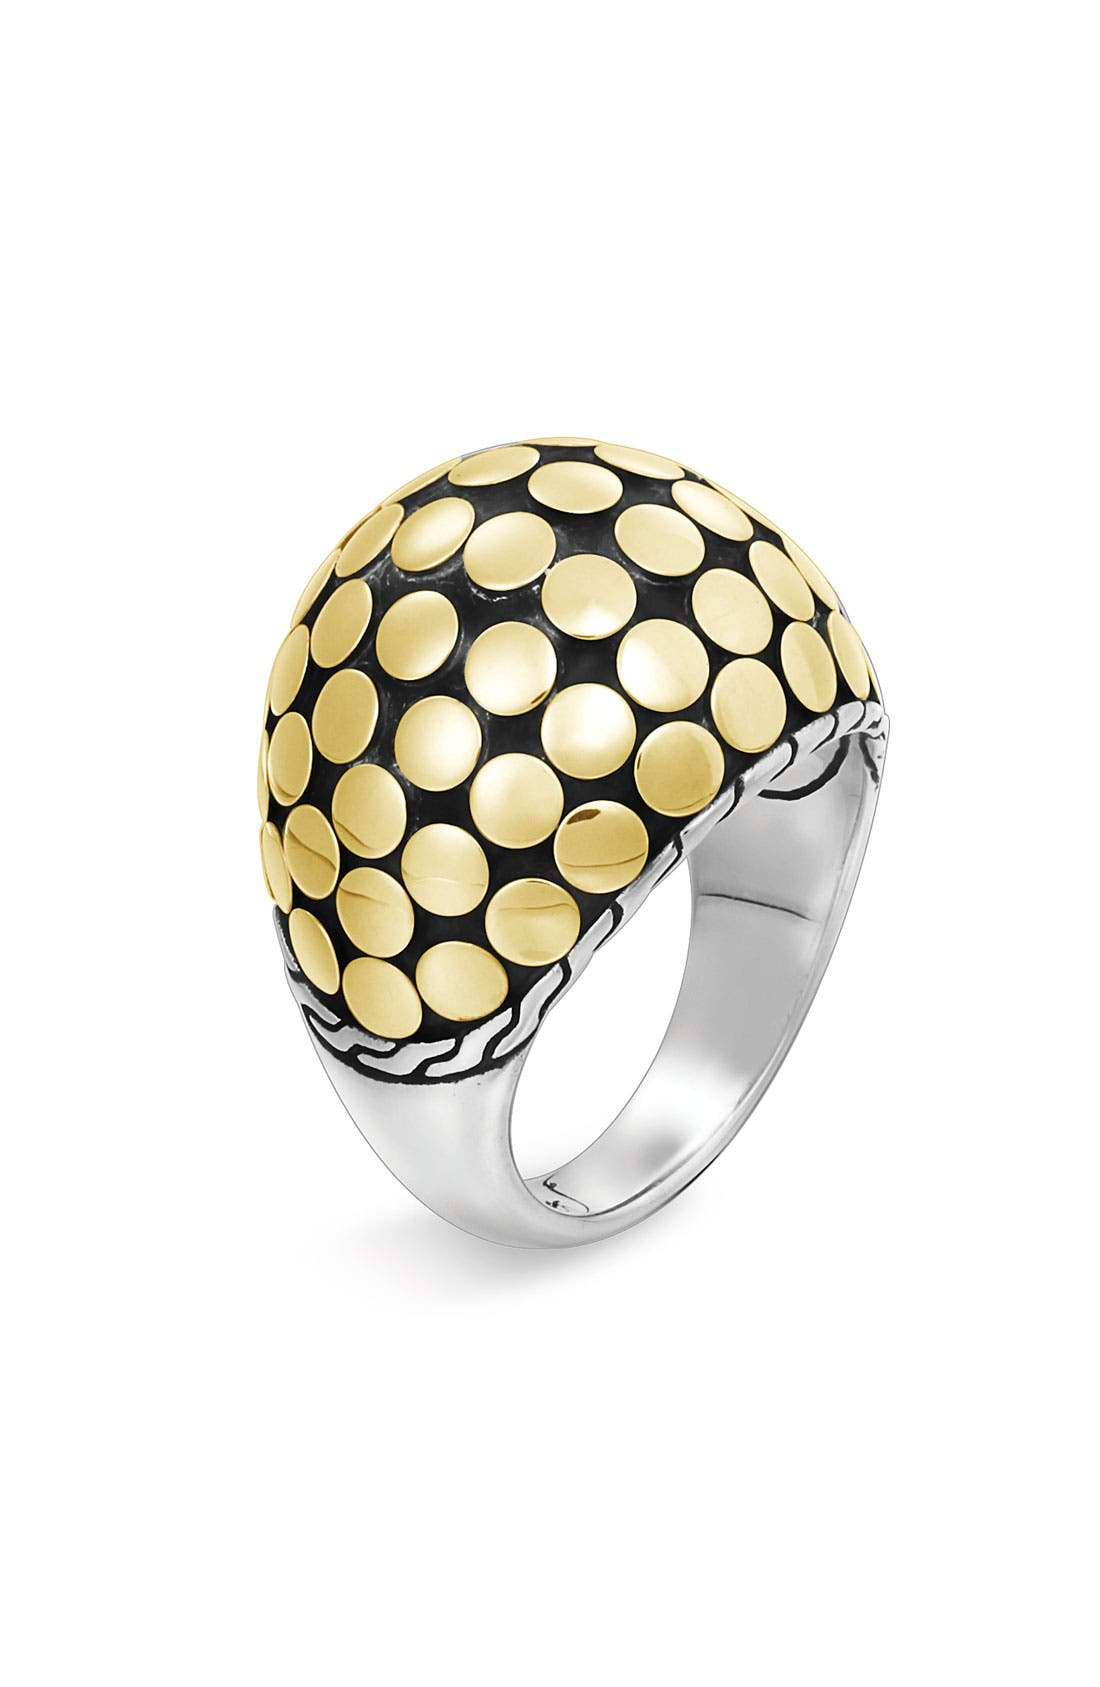 Alternate Image 1 Selected - John Hardy 'Dot Gold' Dome Ring